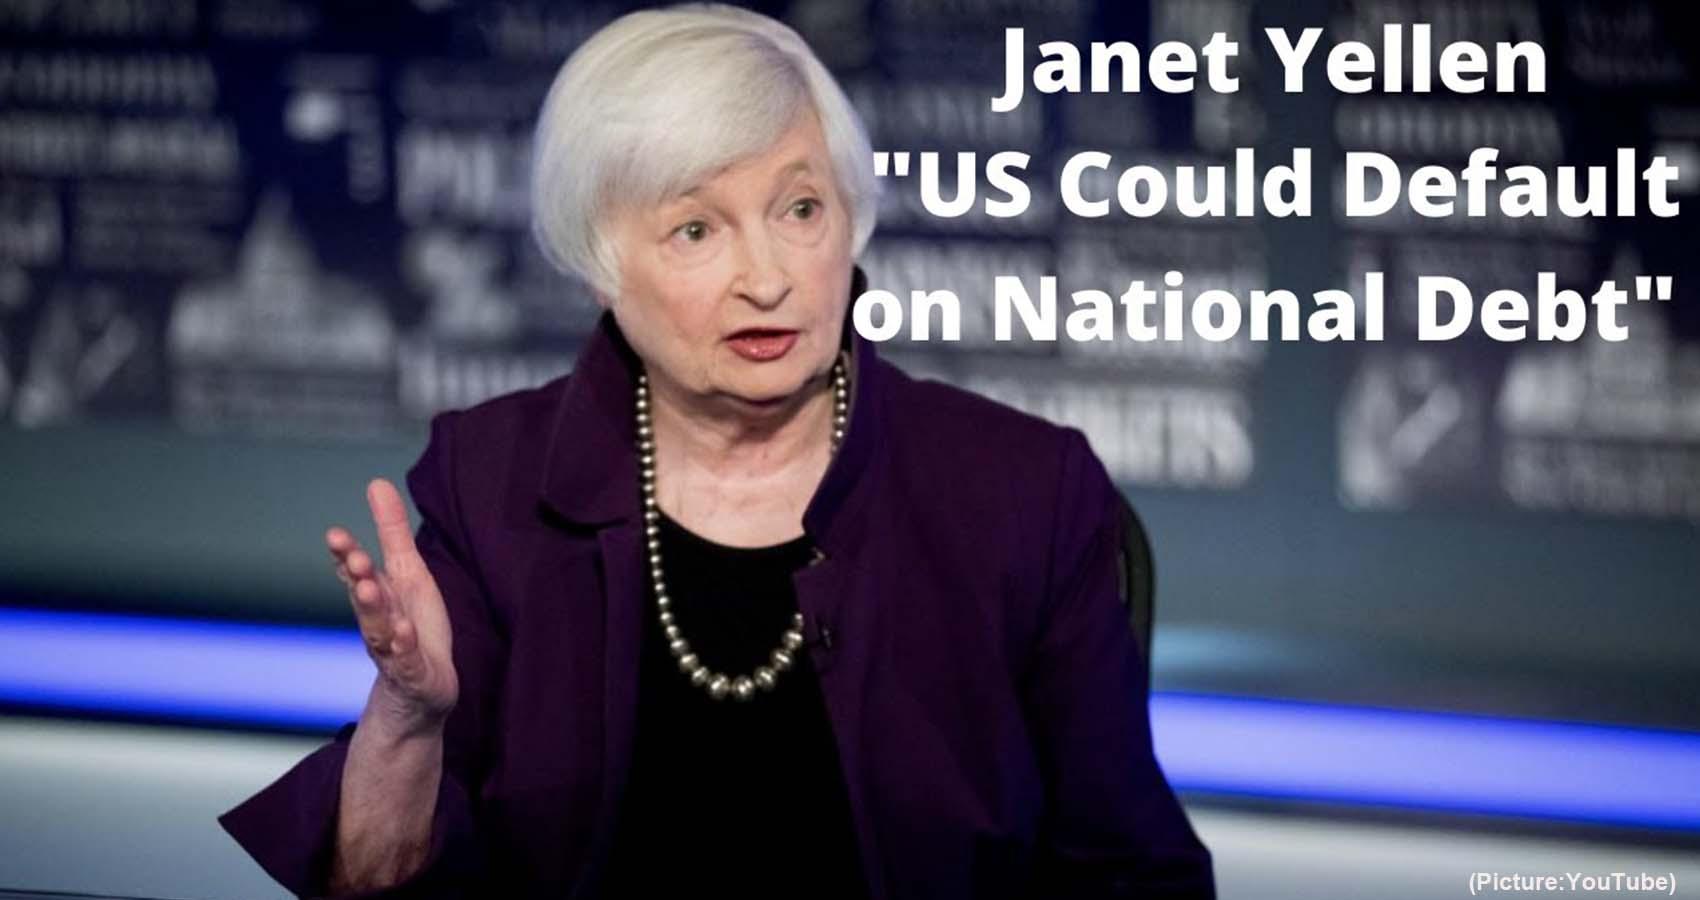 Janet Yellen Warns, US Could Default On National Debt In October